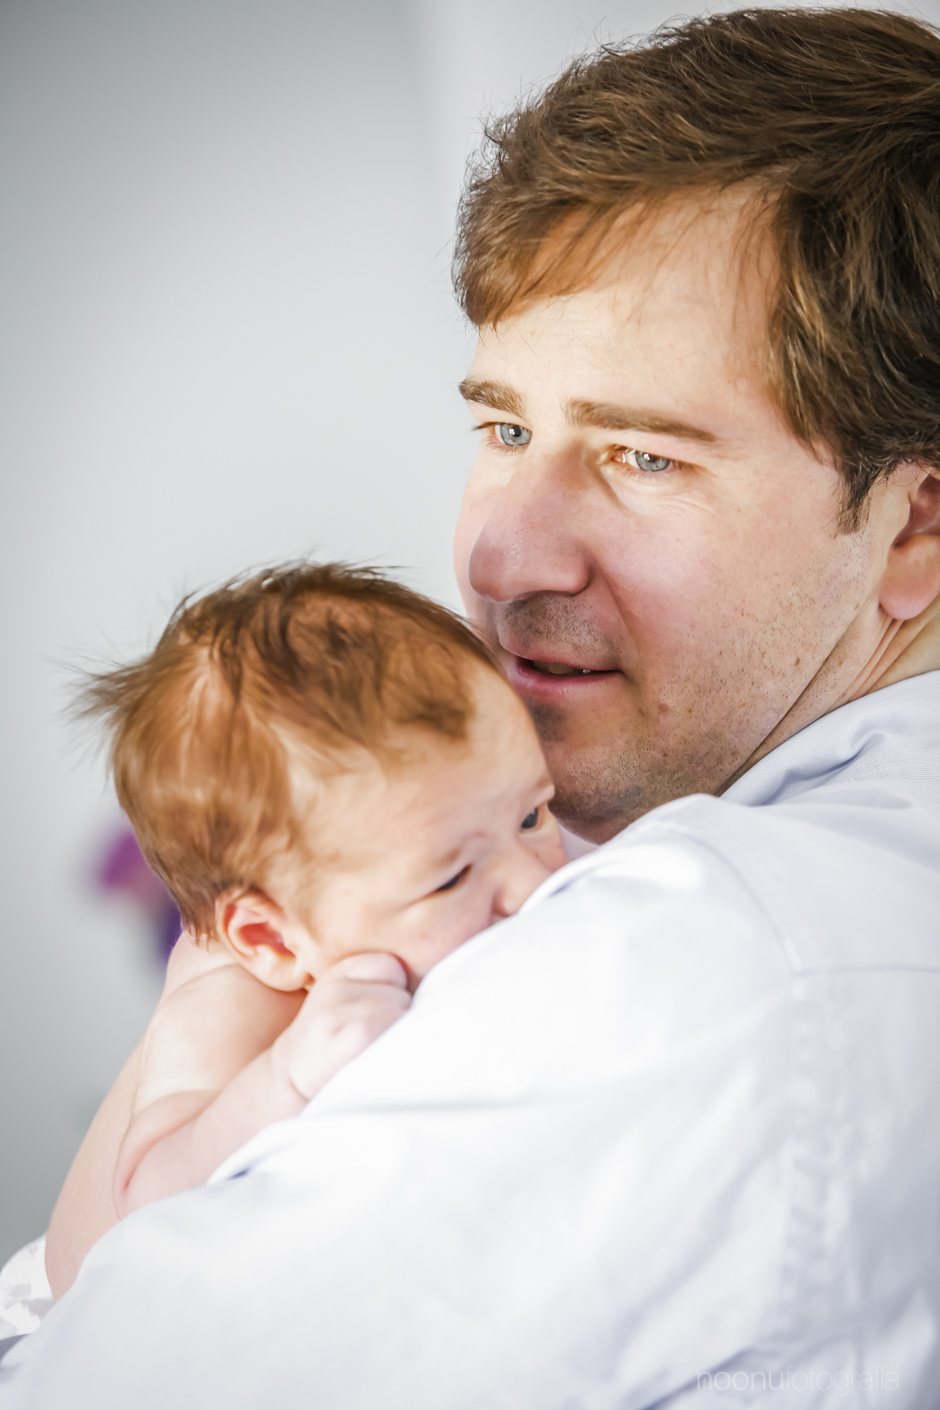 Noonu-fotografos-de-bebes-madrid-Berni 8